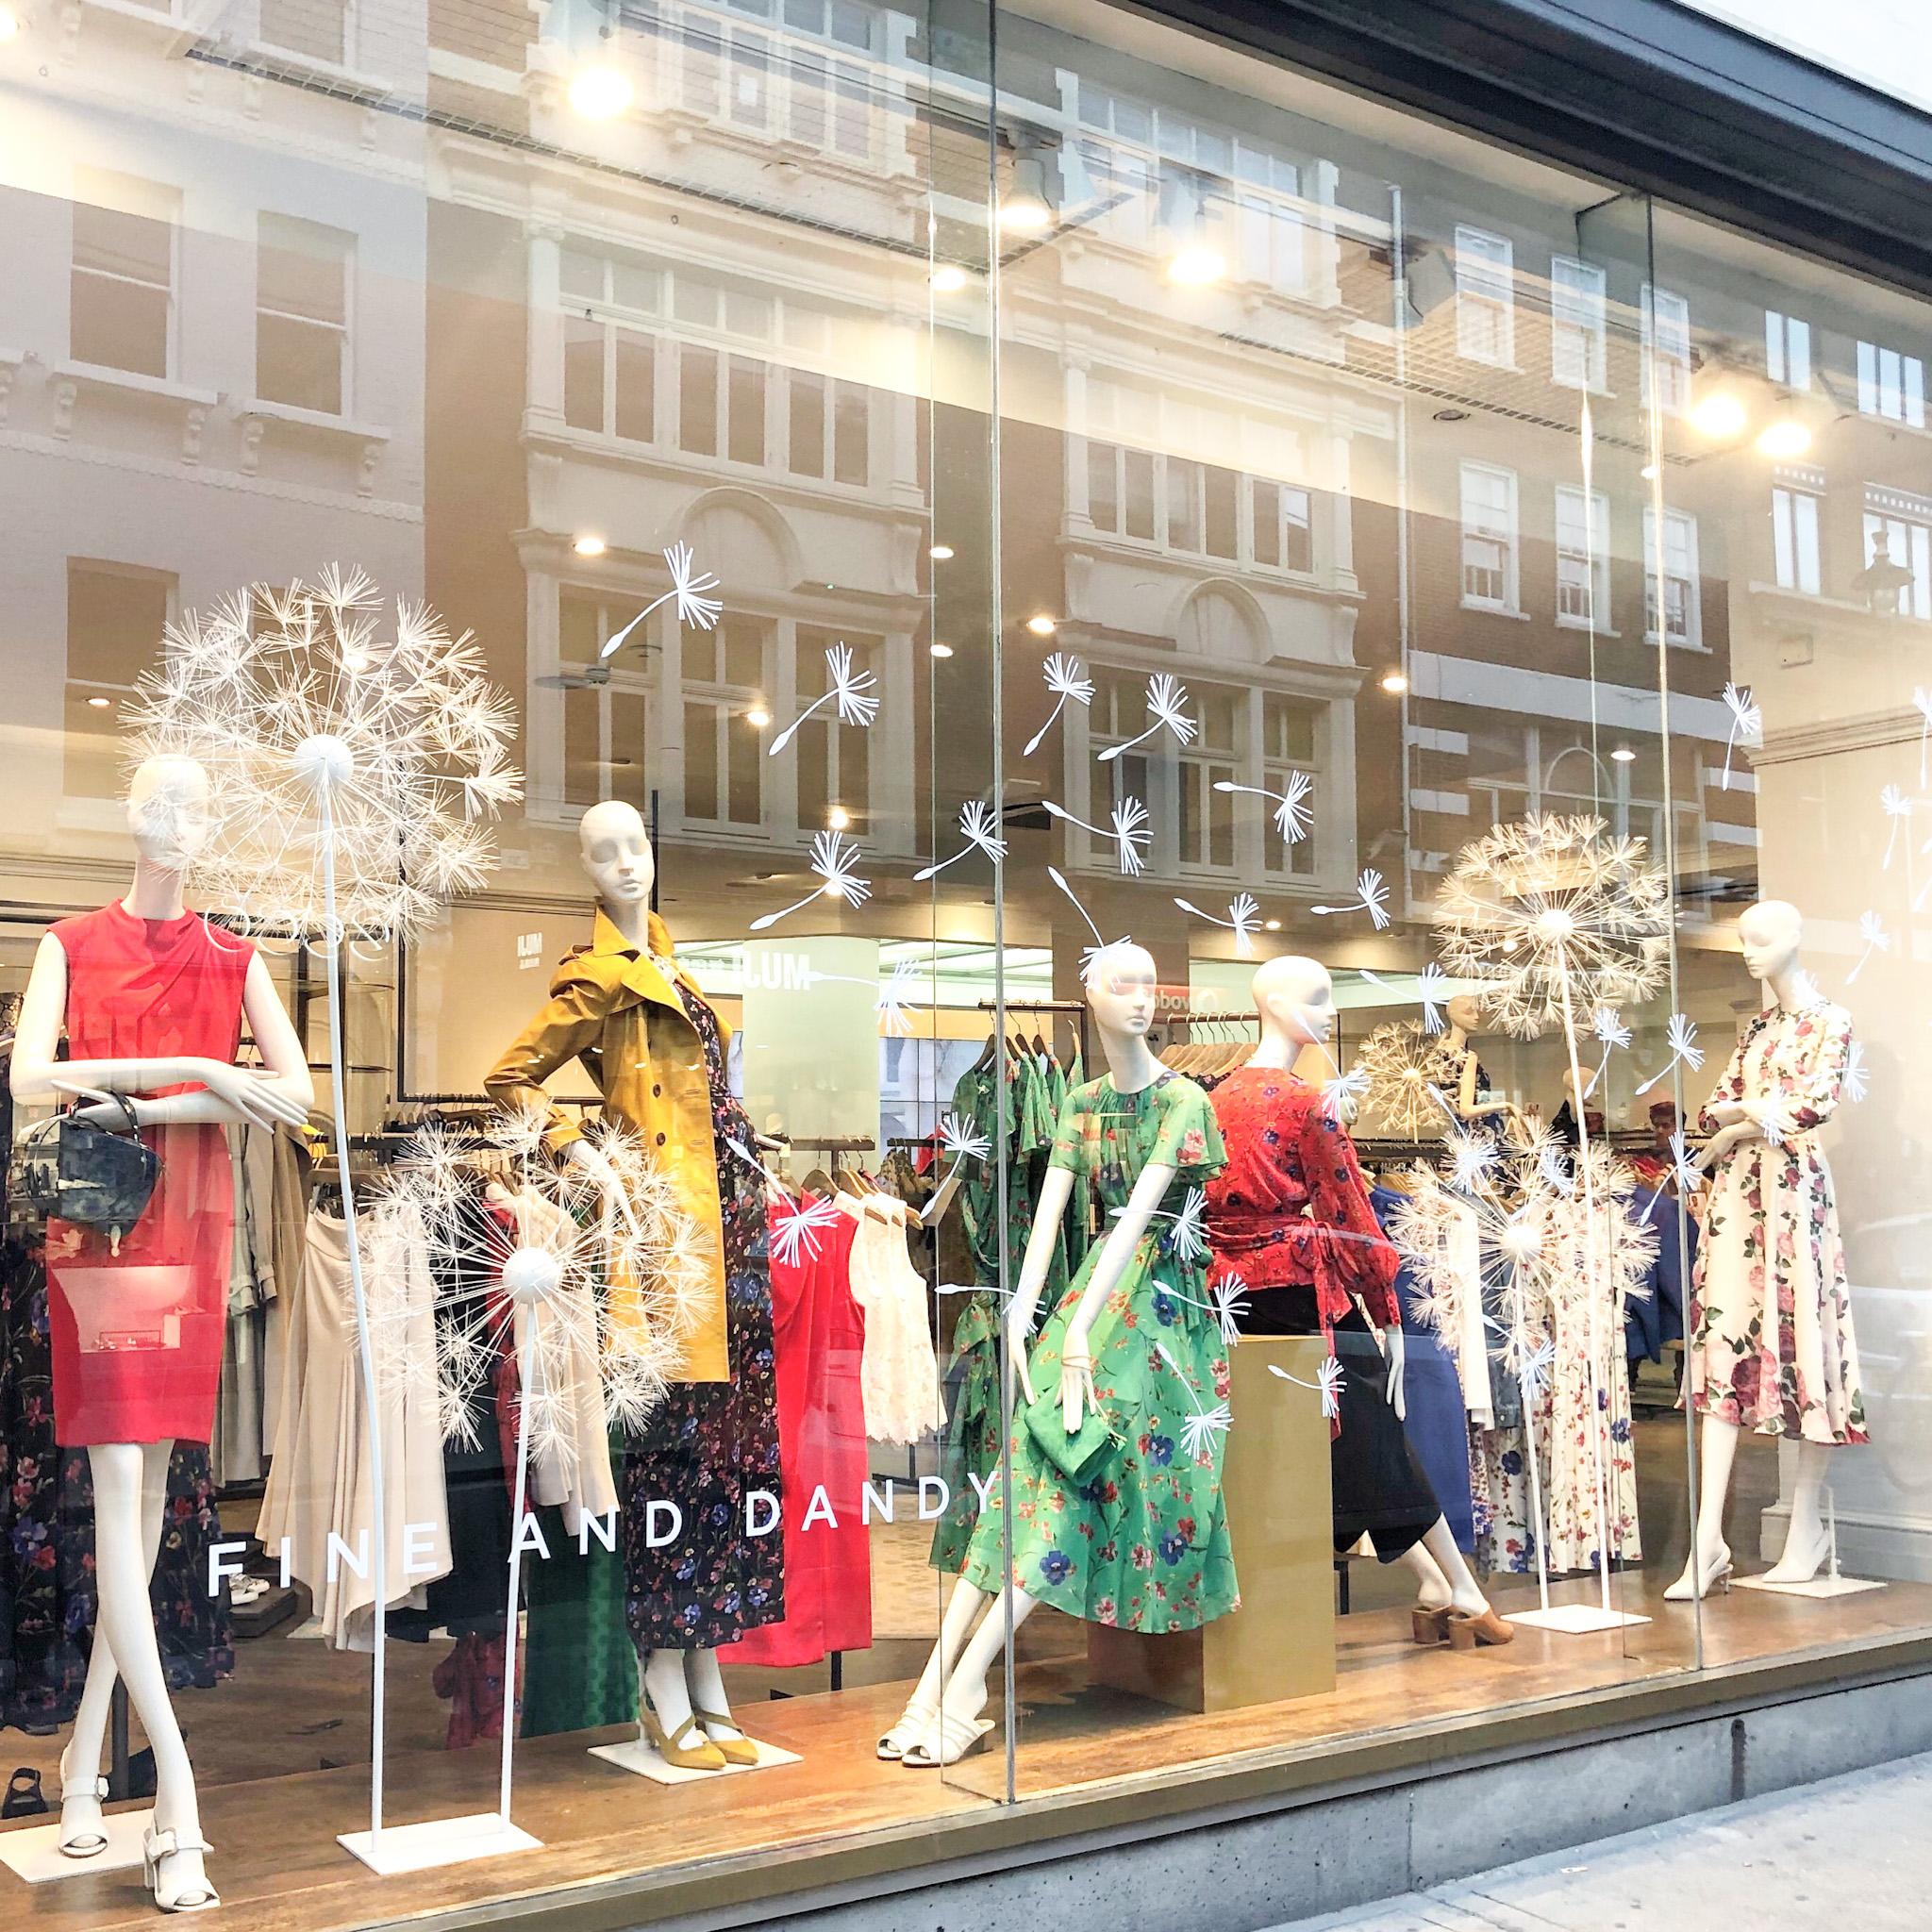 covent garden retail window